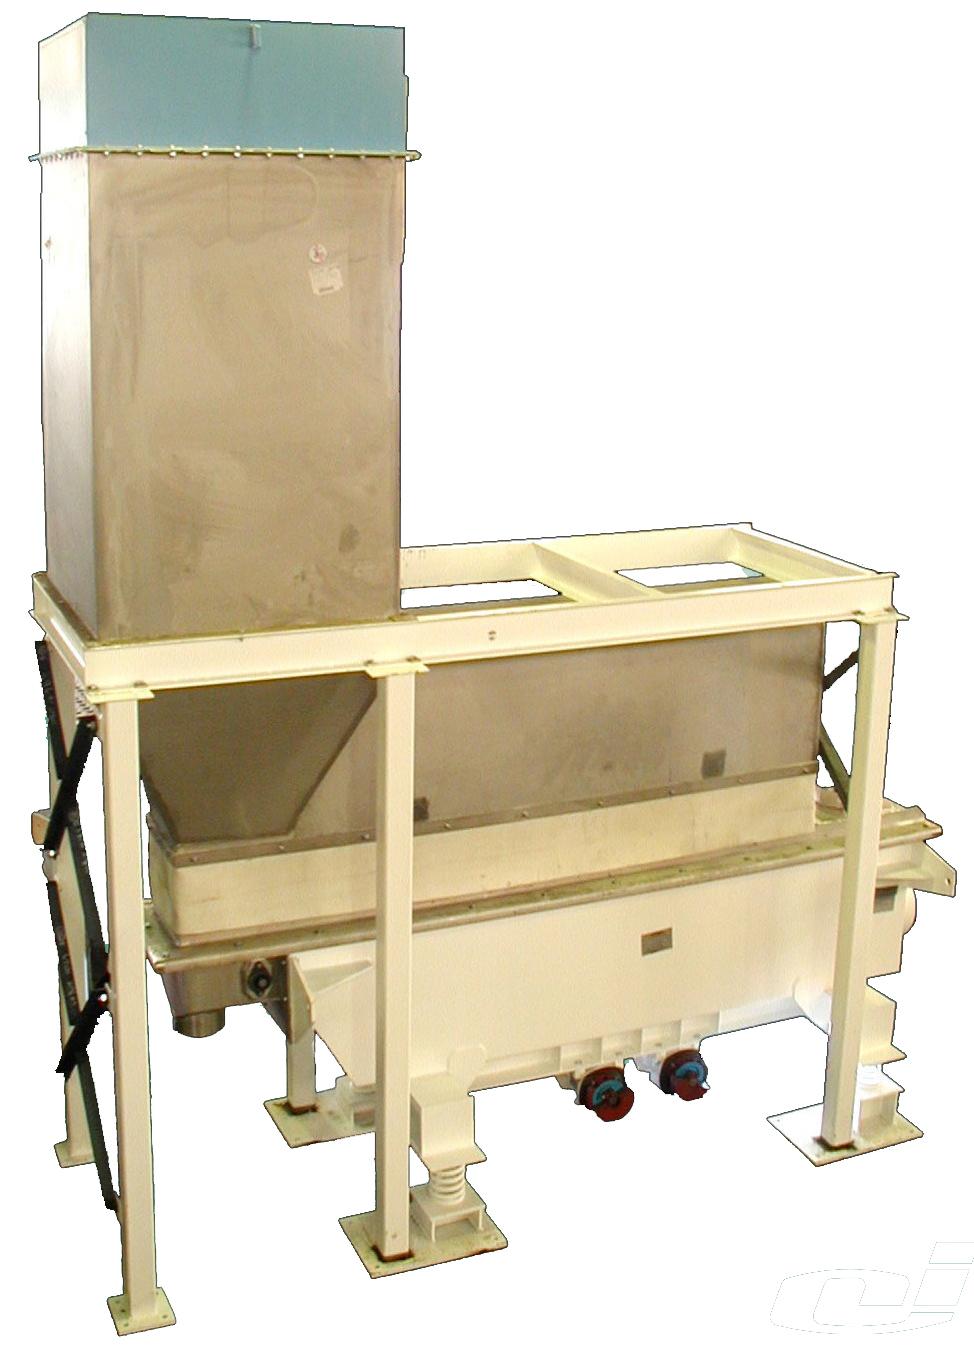 carman industries vibrating fluid bed cooler